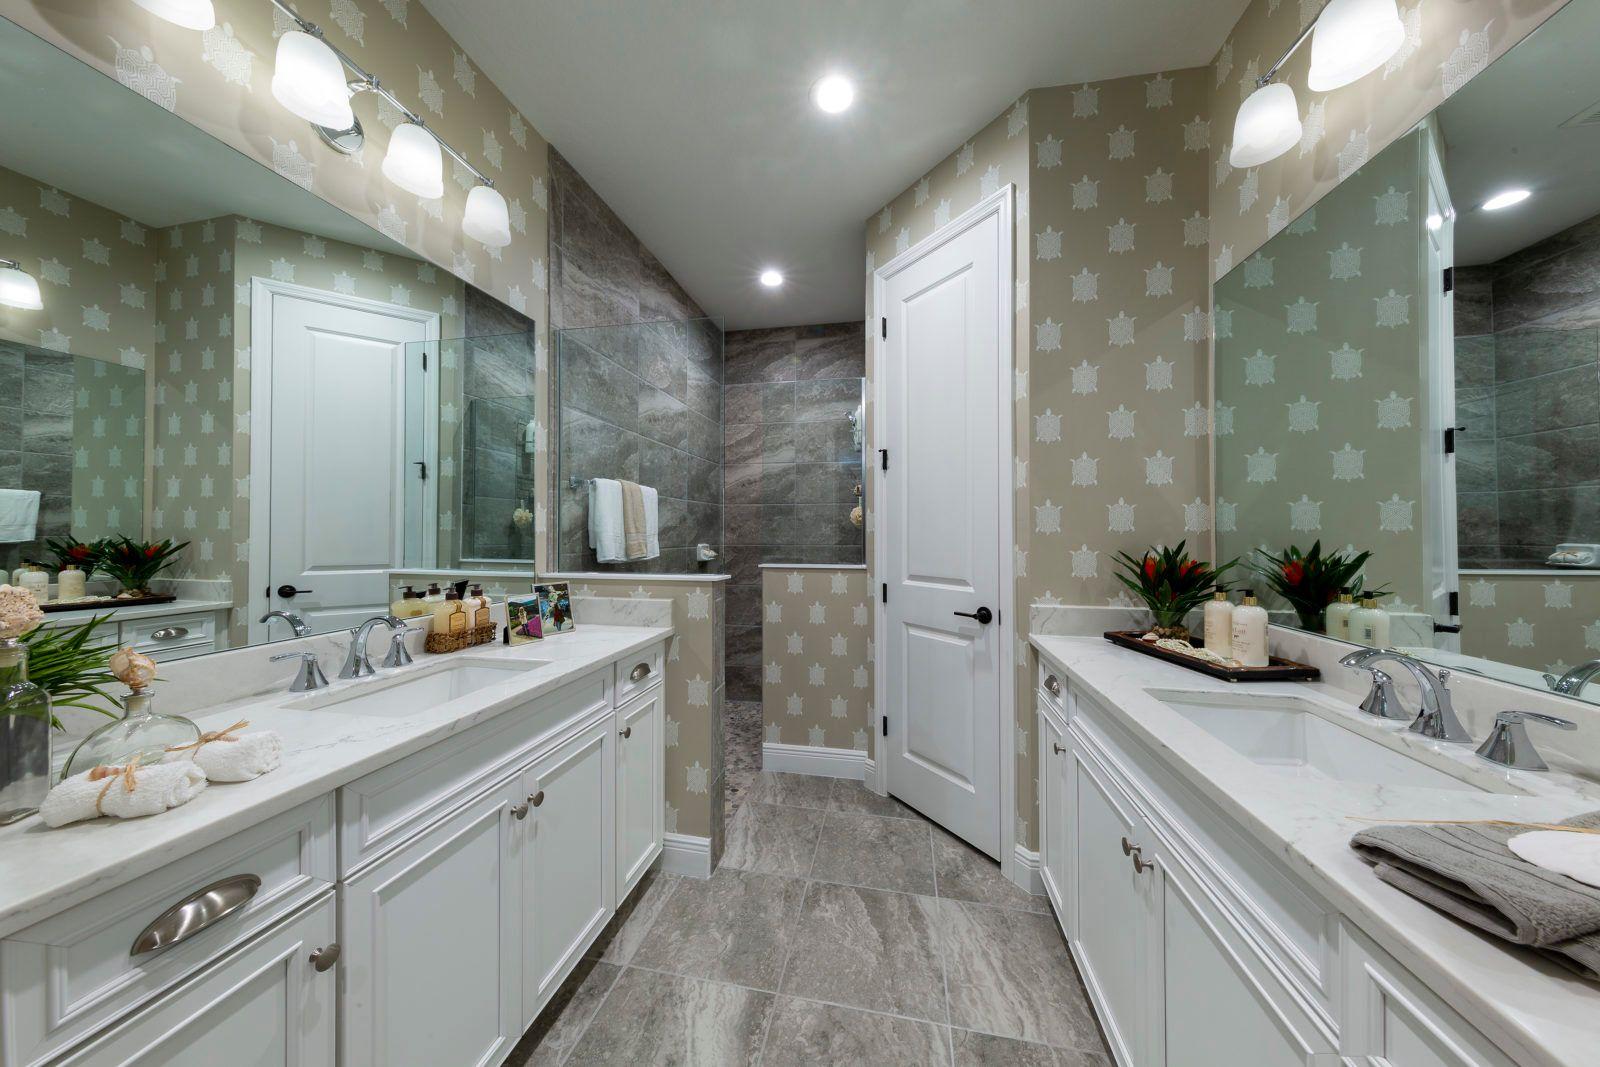 Bathroom featured in the Tidewater By Neal Communities in Sarasota-Bradenton, FL